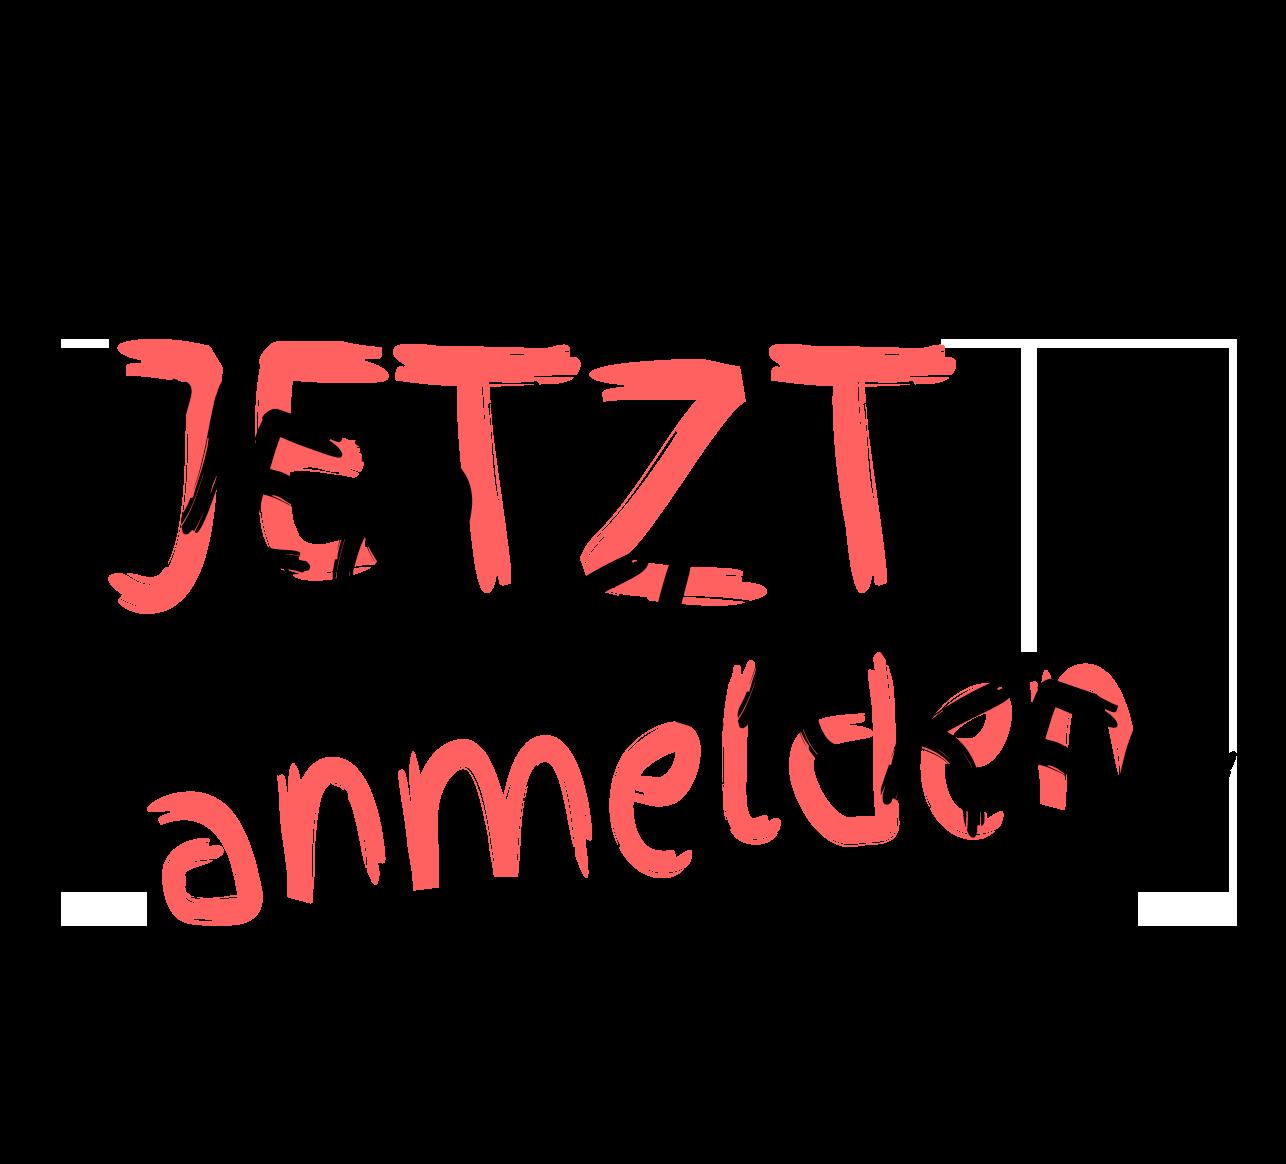 alternativer_text